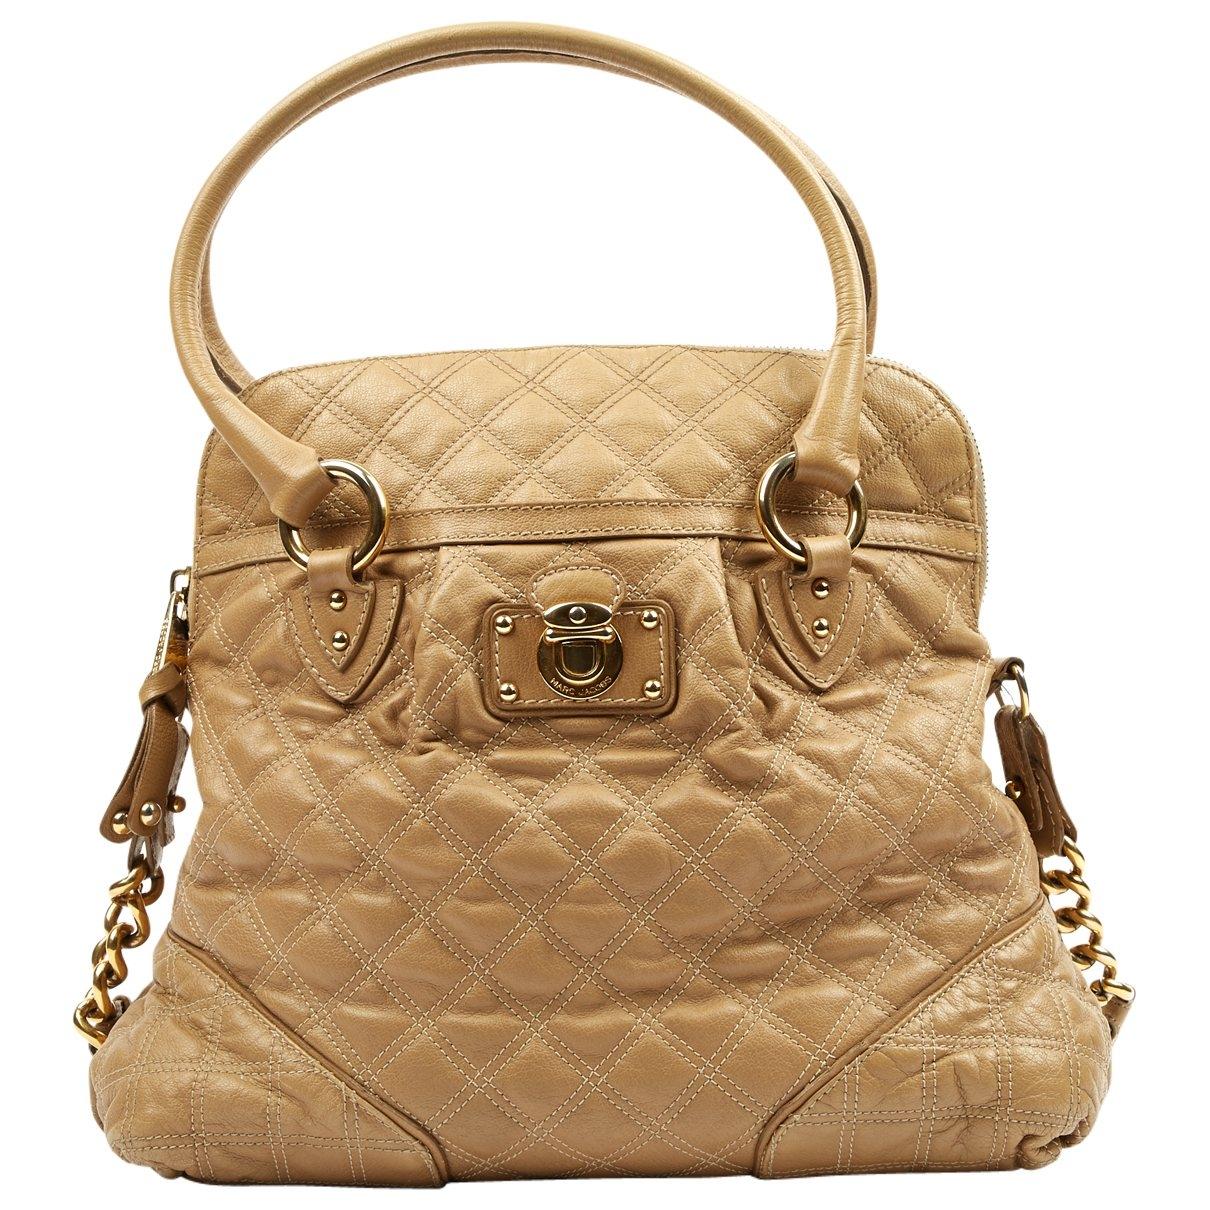 Marc Jacobs \N Beige Leather handbag for Women \N